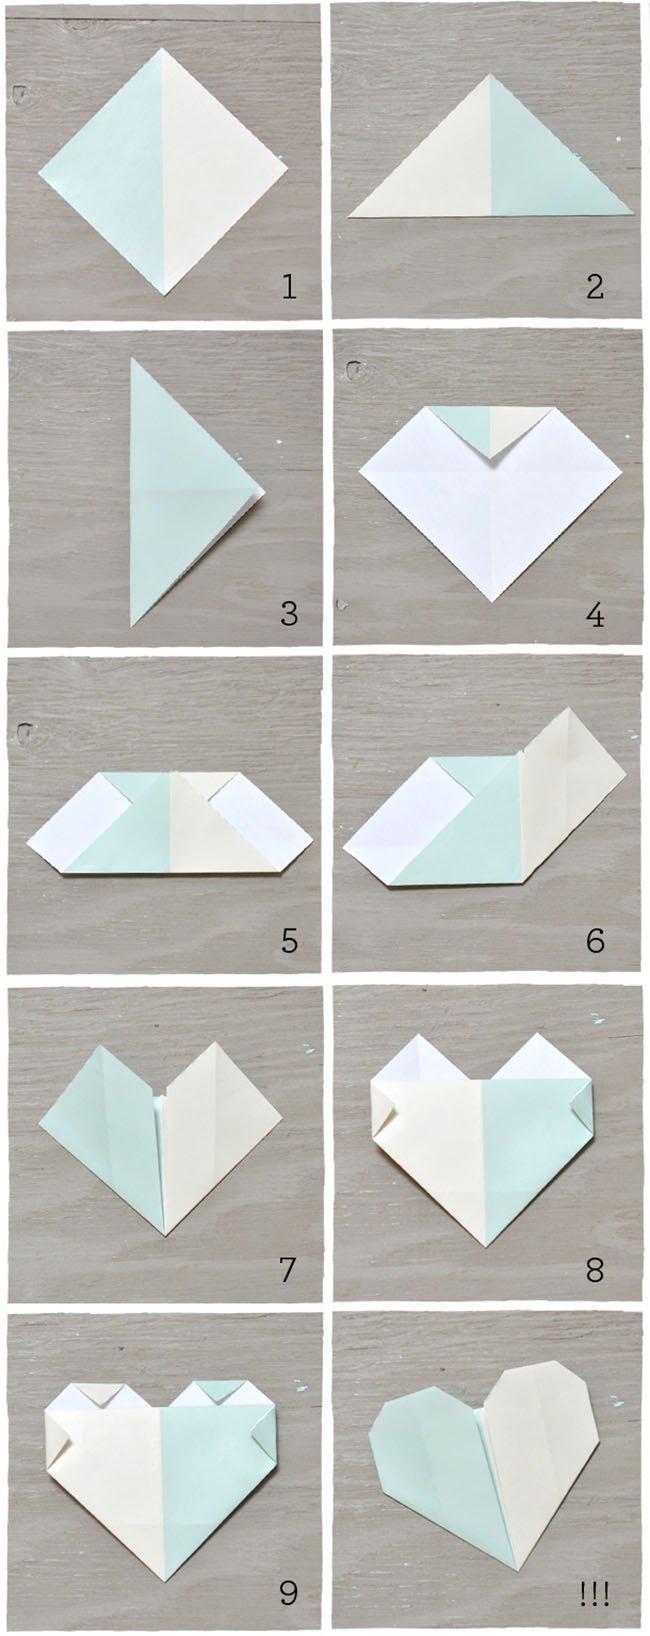 tarjetas de origami